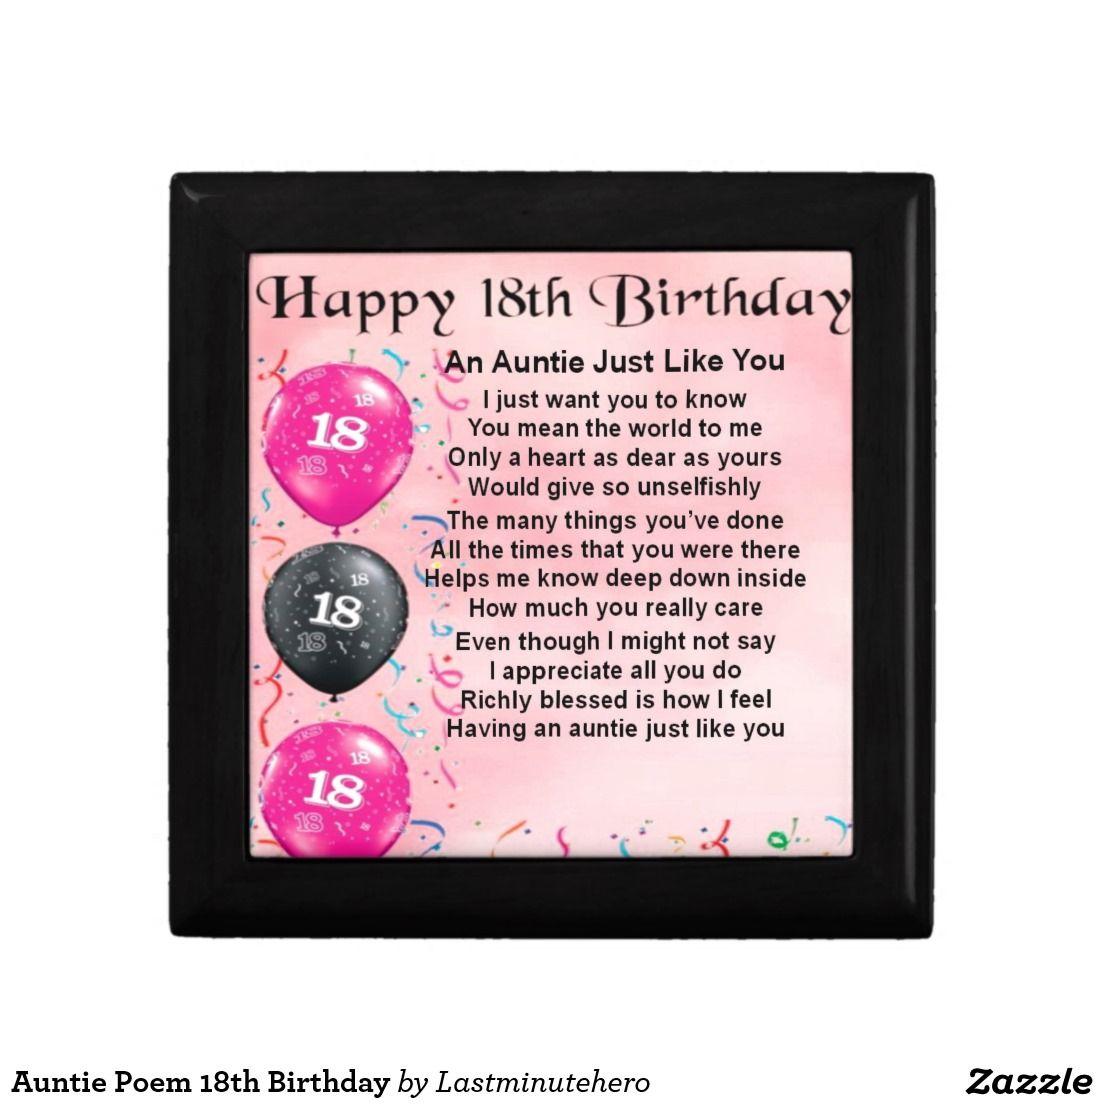 Auntie Poem 18th Birthday Gift Box Zazzle.co.uk